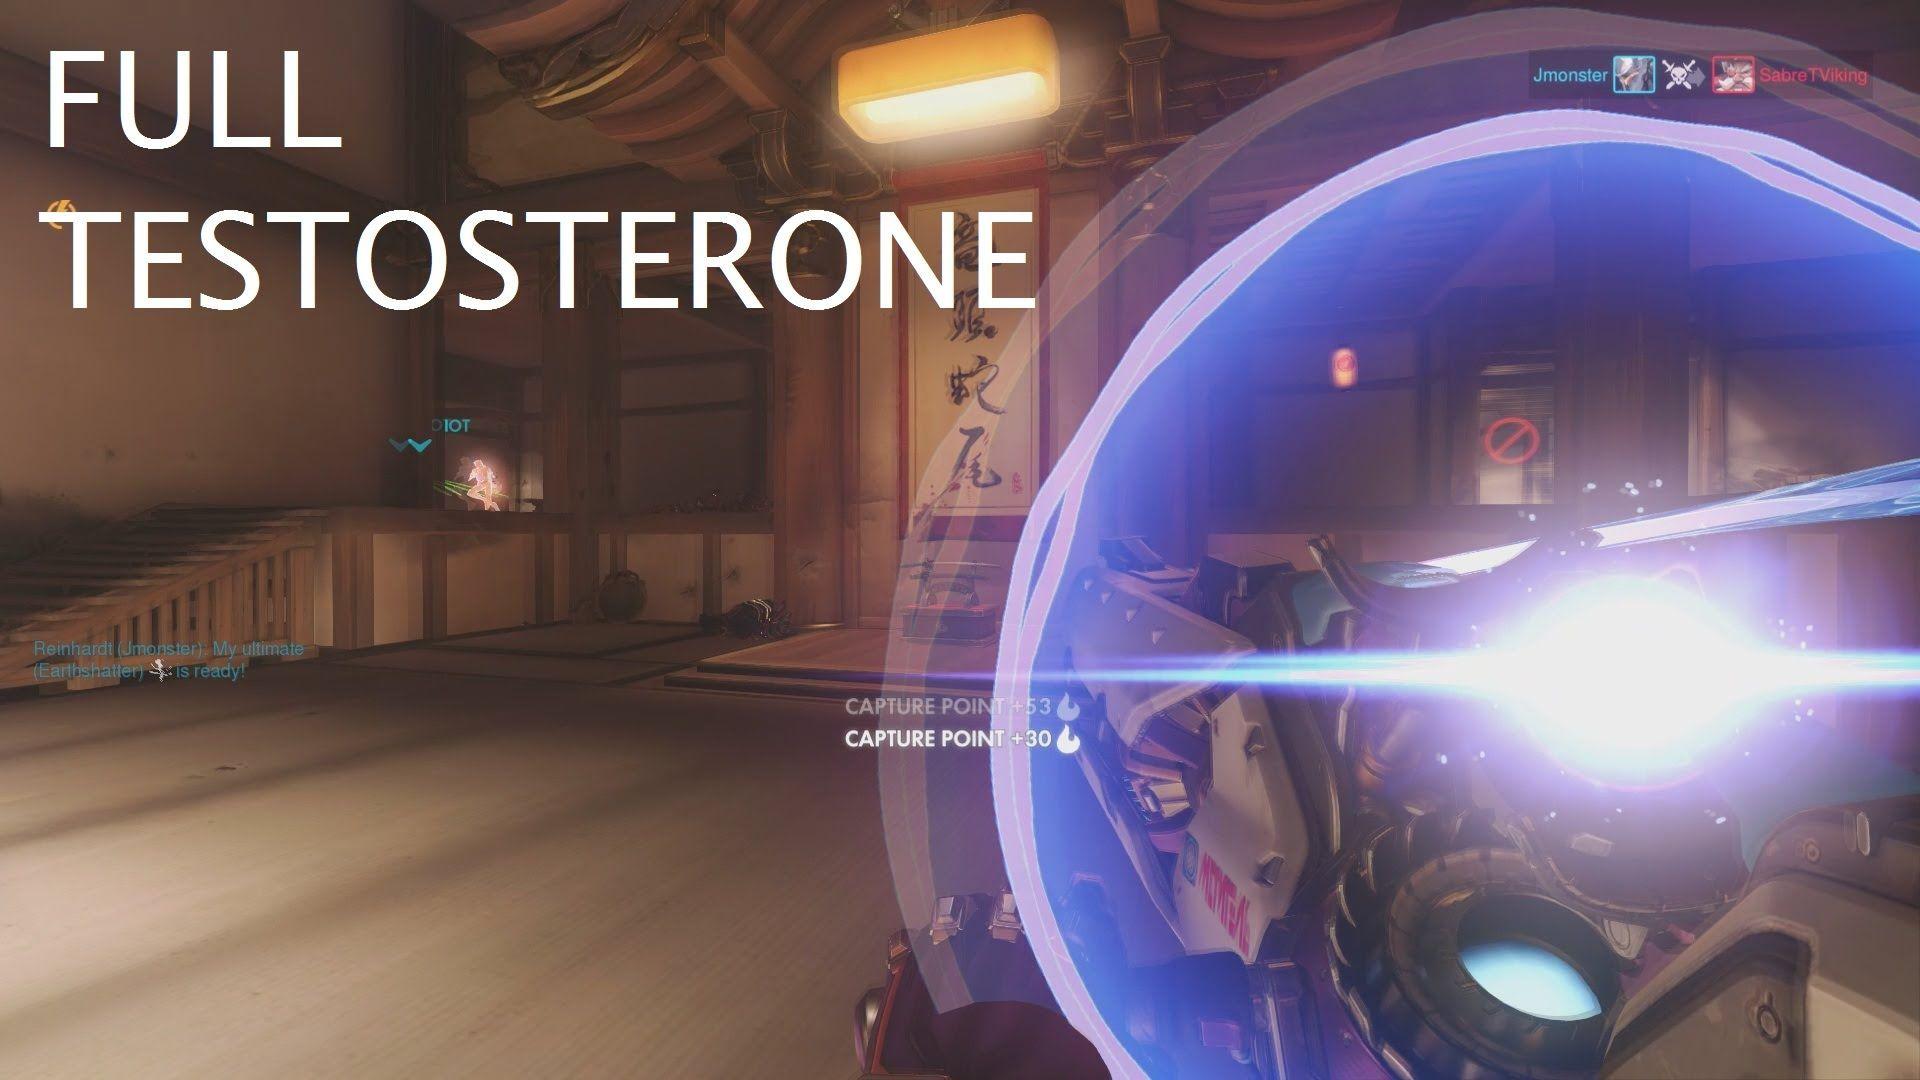 OVERWATCH- Full Testosterone Zarya